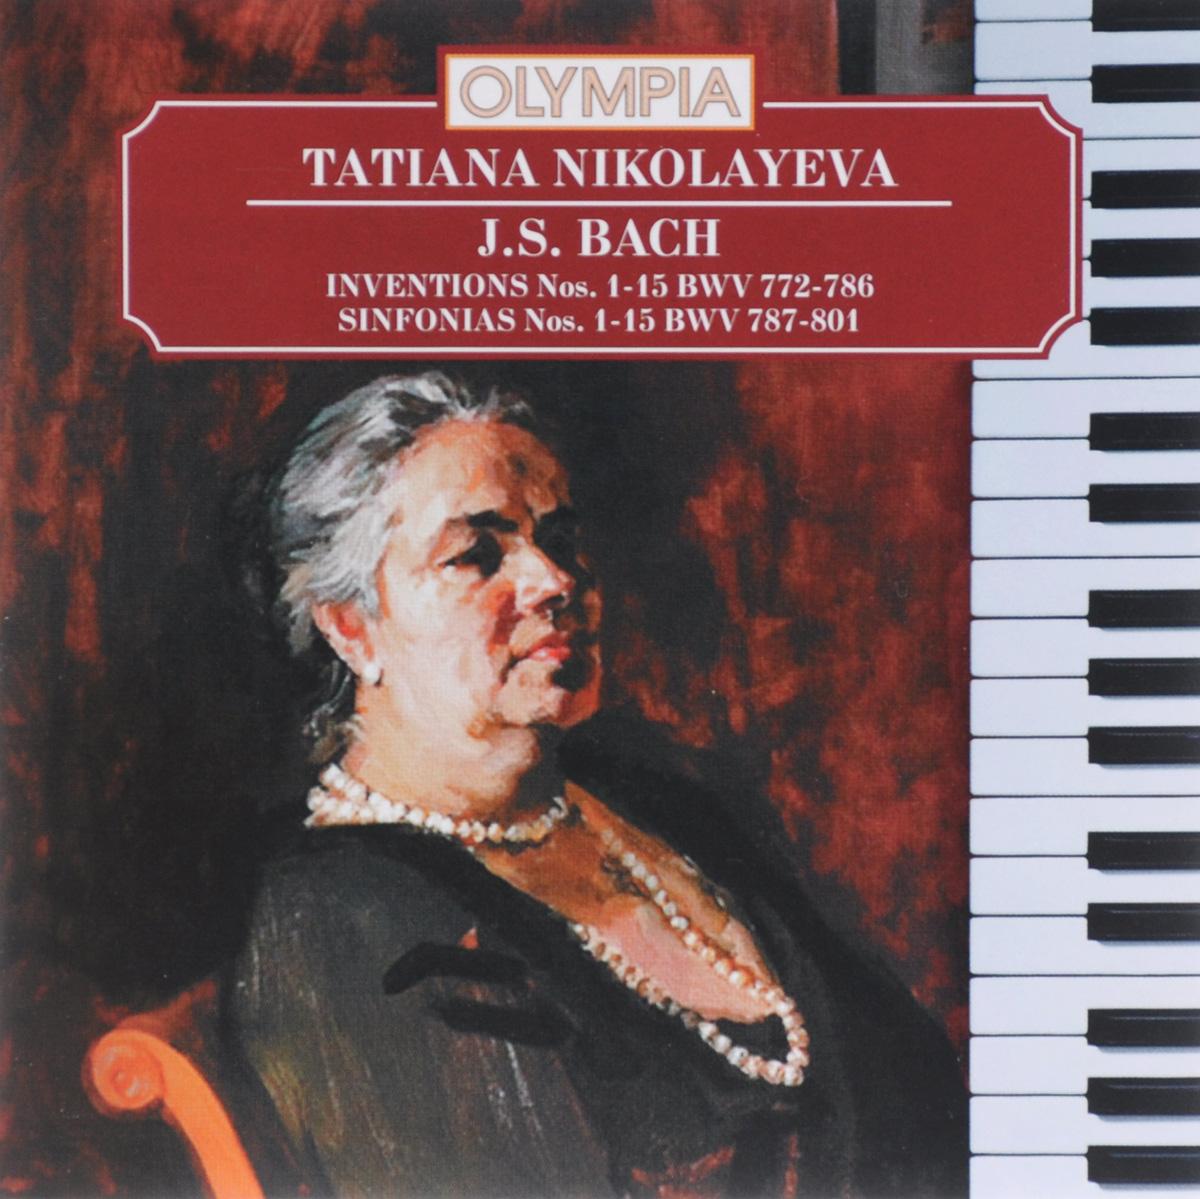 все цены на Татьяна Николаева Tatiana Nikolayeva. J.S. Bach. Inventions Nos. 1-15 BWV 772-786 / Sinfonias Nos. 1-15 BWV 787-801 онлайн